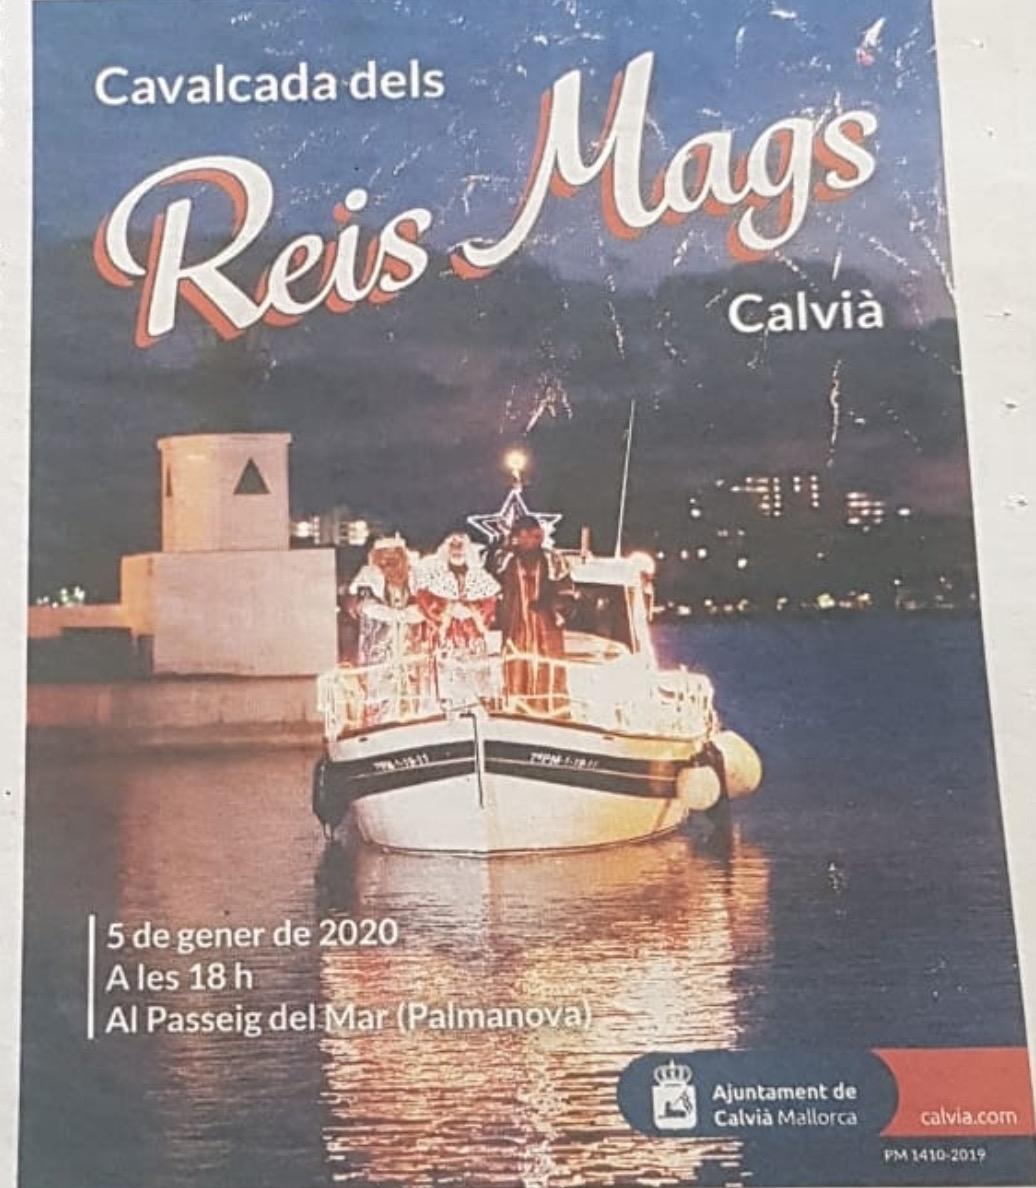 CALVIÀ: CABALGATA DE SSMM LOS REYES MAGOS (05/01/20)